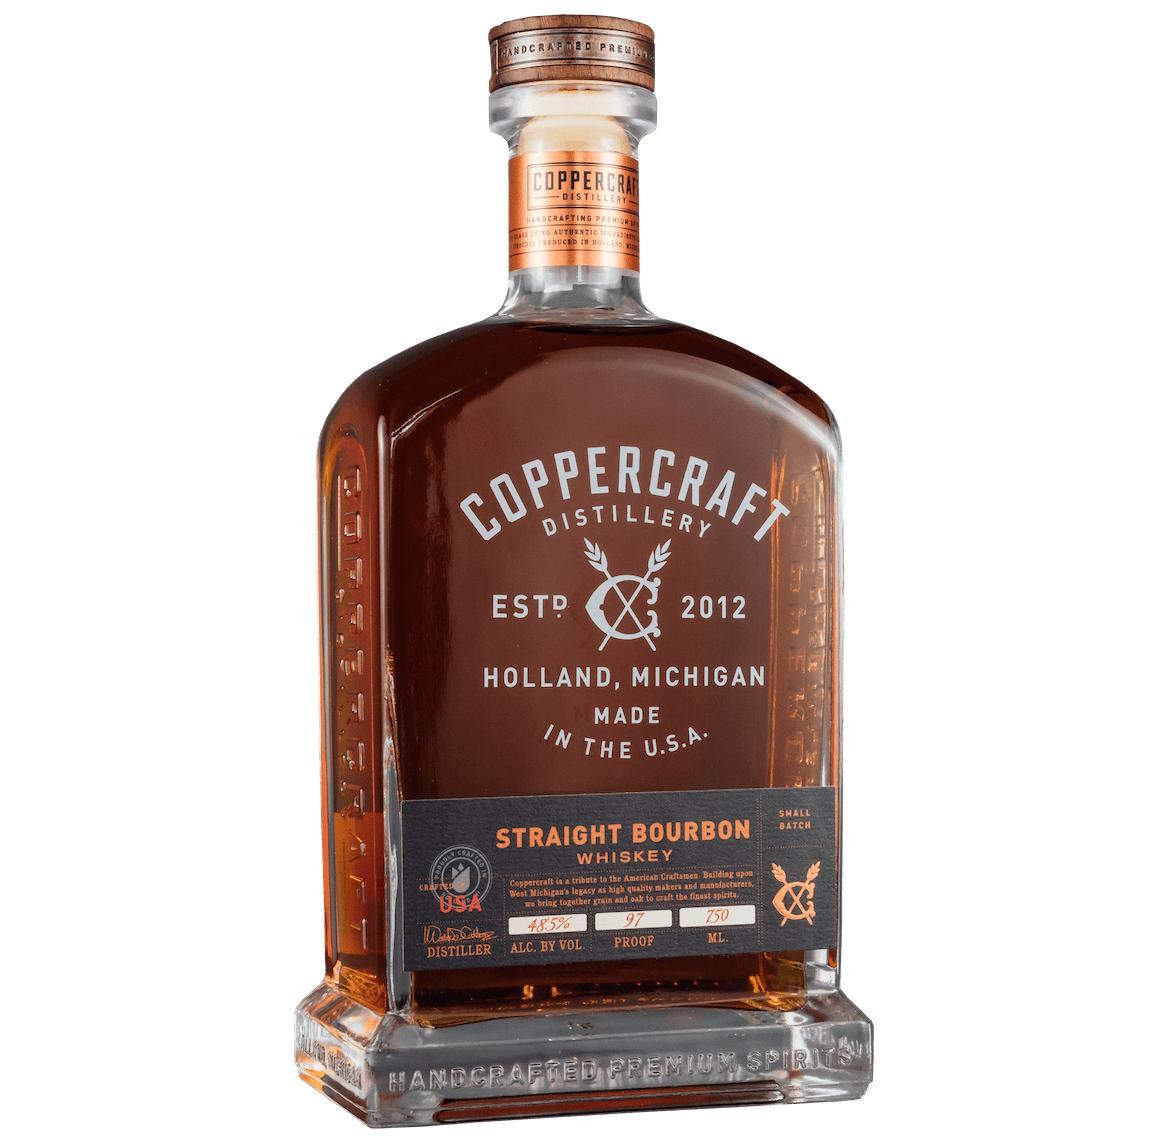 Coppercraft Straight Bourbon